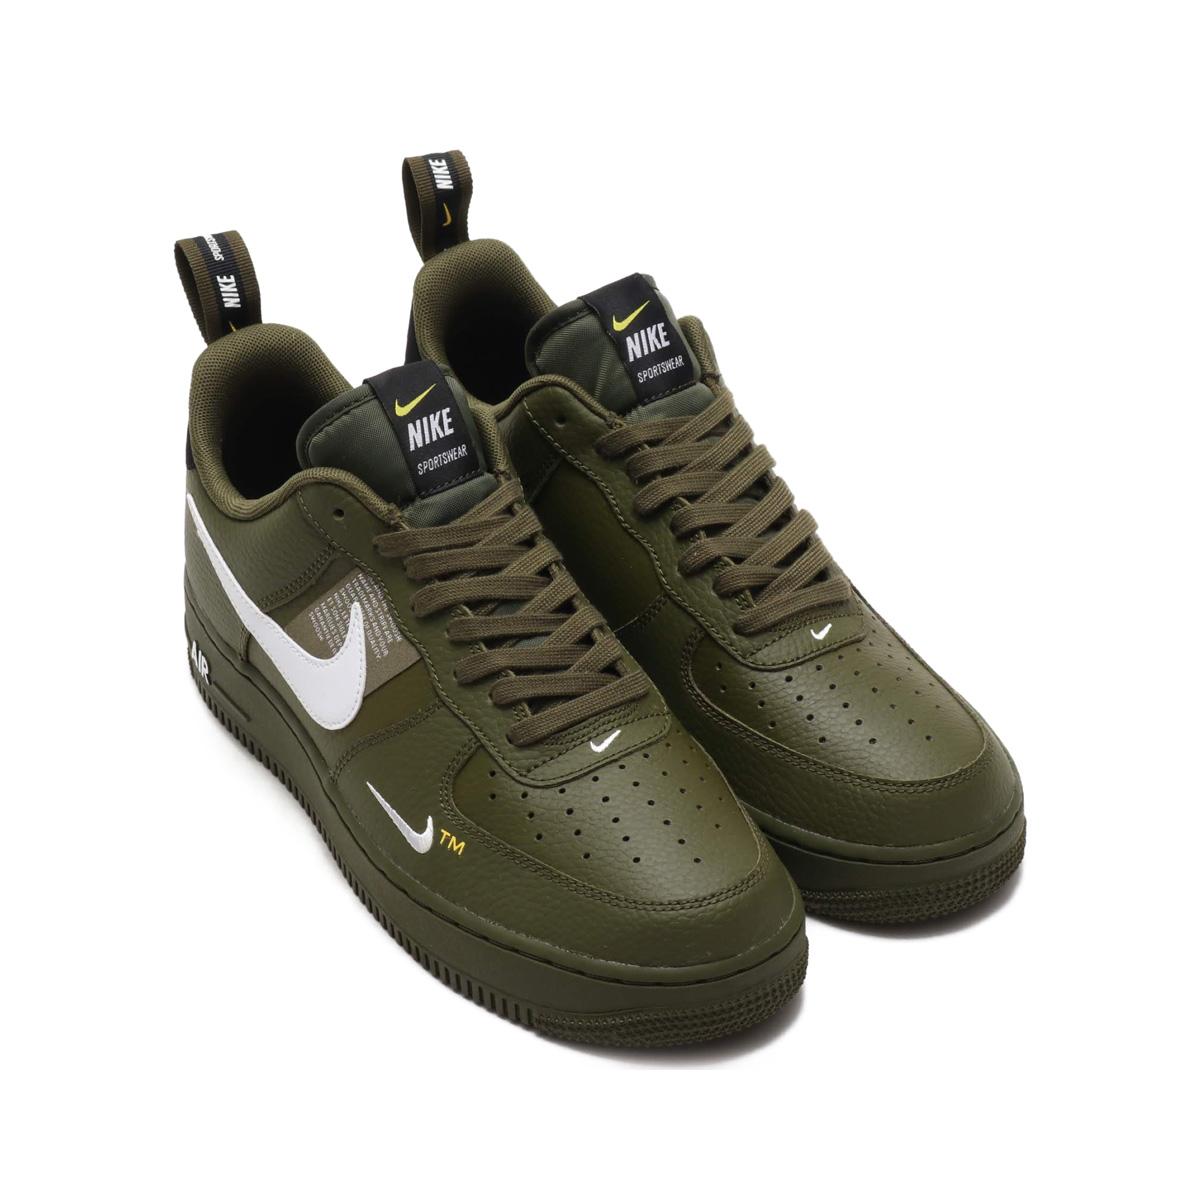 Force Tour Nike Utilitynike 1 07 18ho Air Black Lv8 UtilityOlive Yellow S Canvaswhite '07 sQrCdxBht